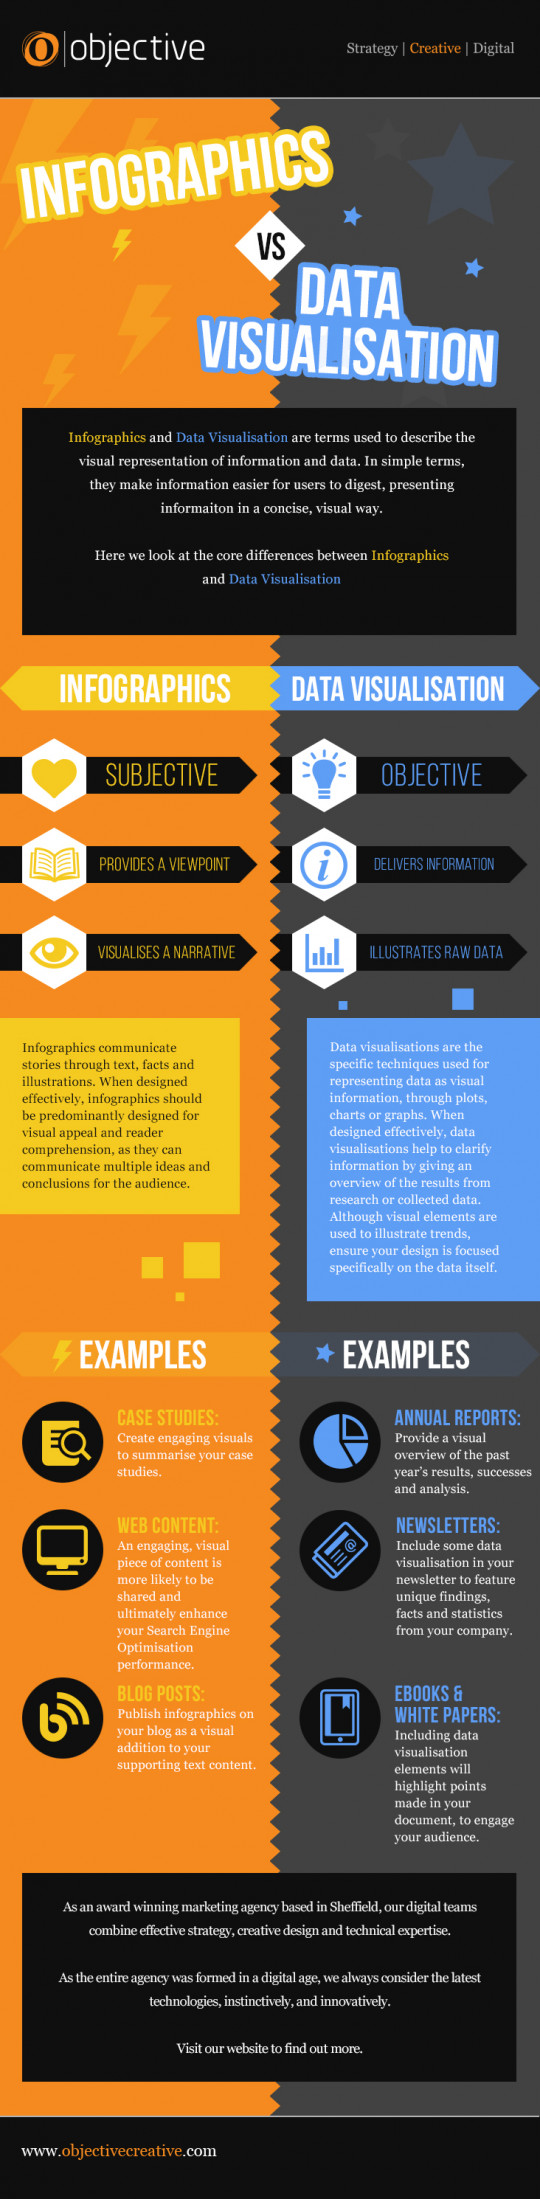 Infographics vs Data Visualisation